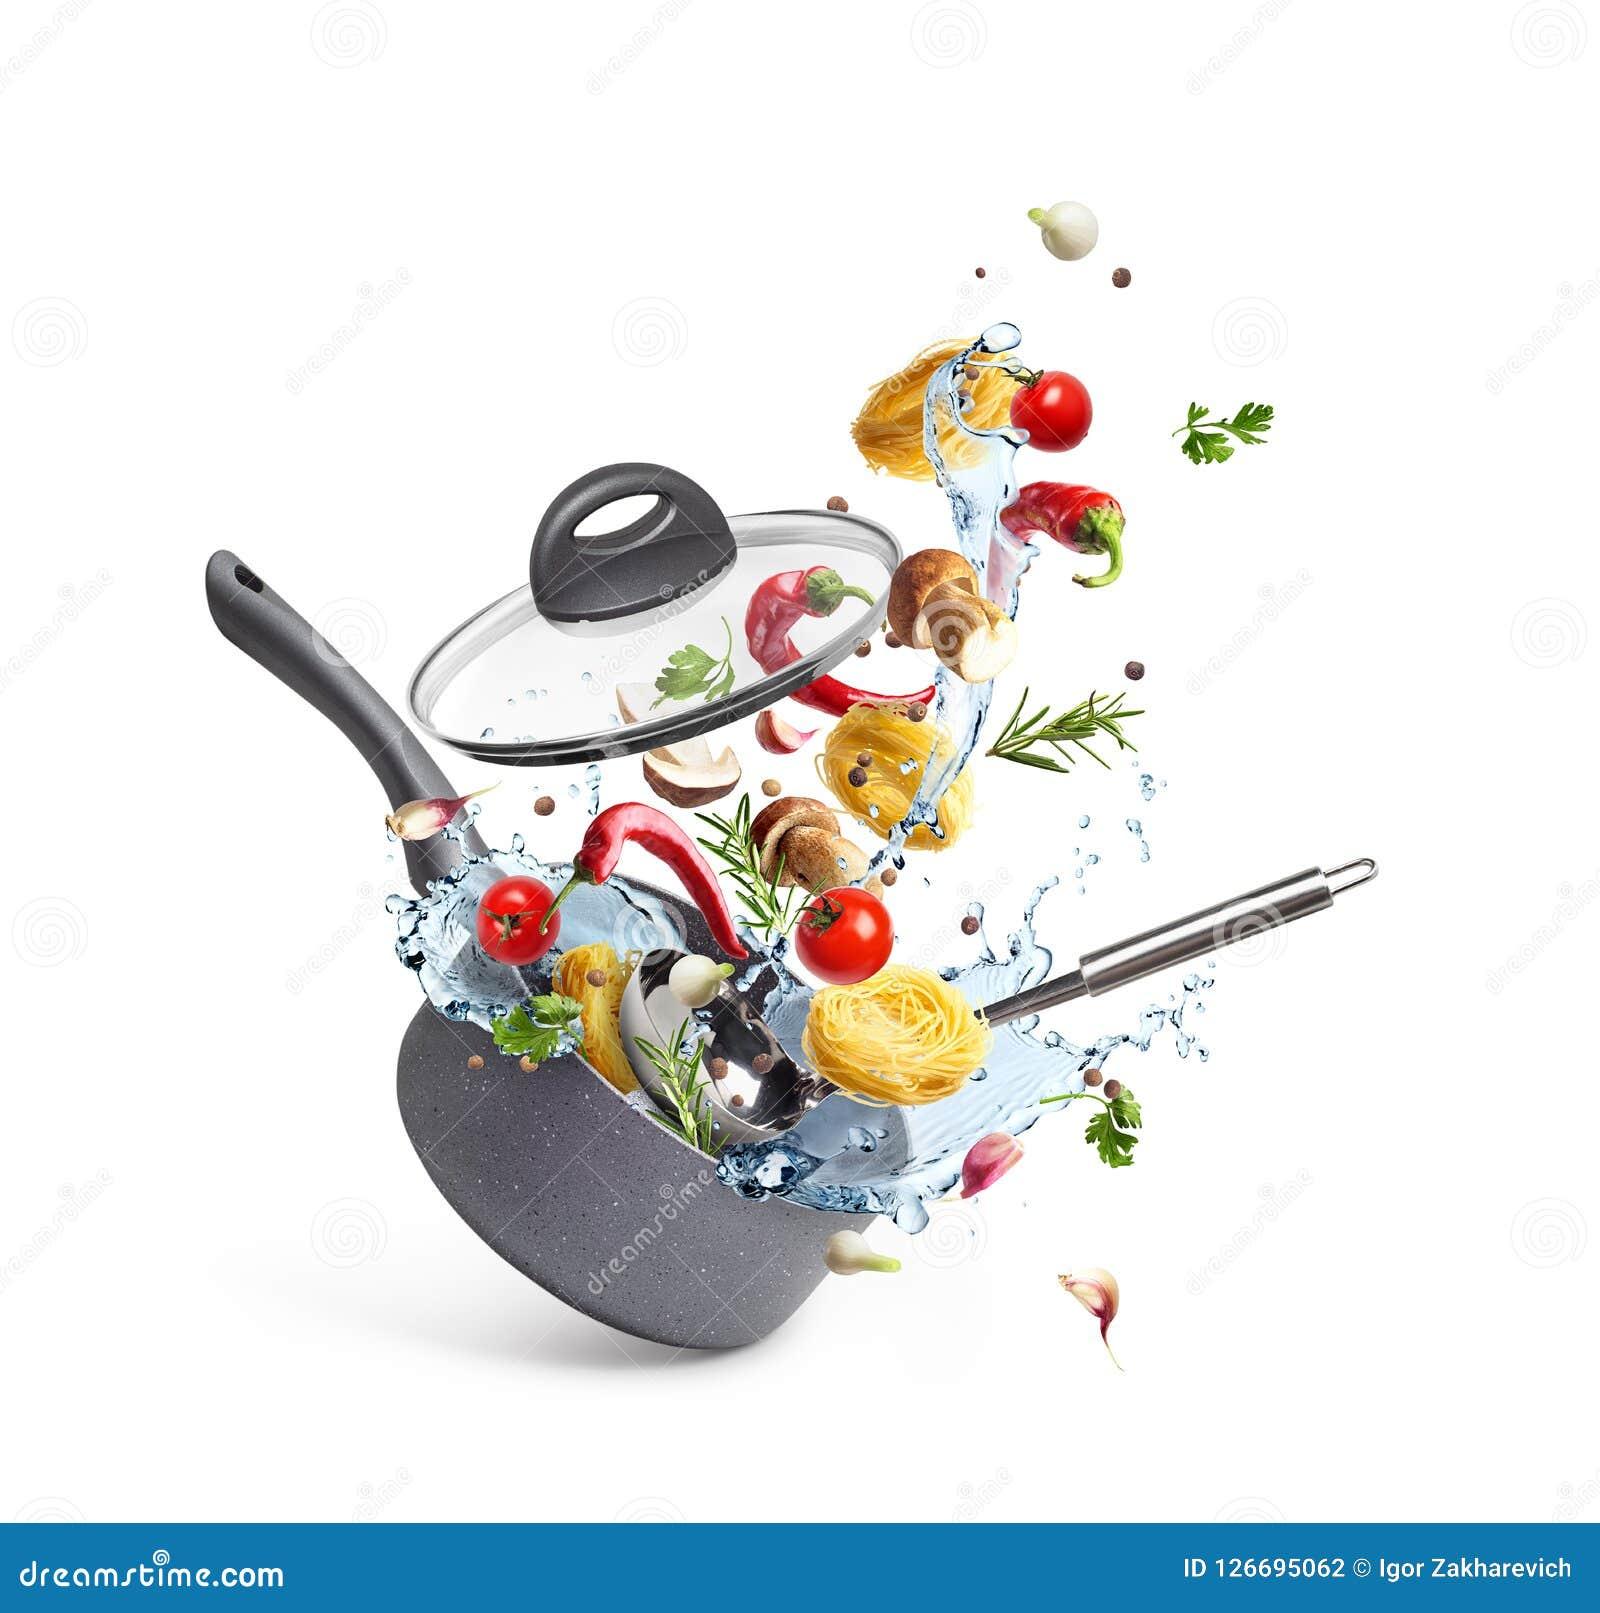 Casserole με τα ζυμαρικά και τα μανιτάρια με τα λαχανικά και το νερό καταβρέχουν, μετεωρισμός,